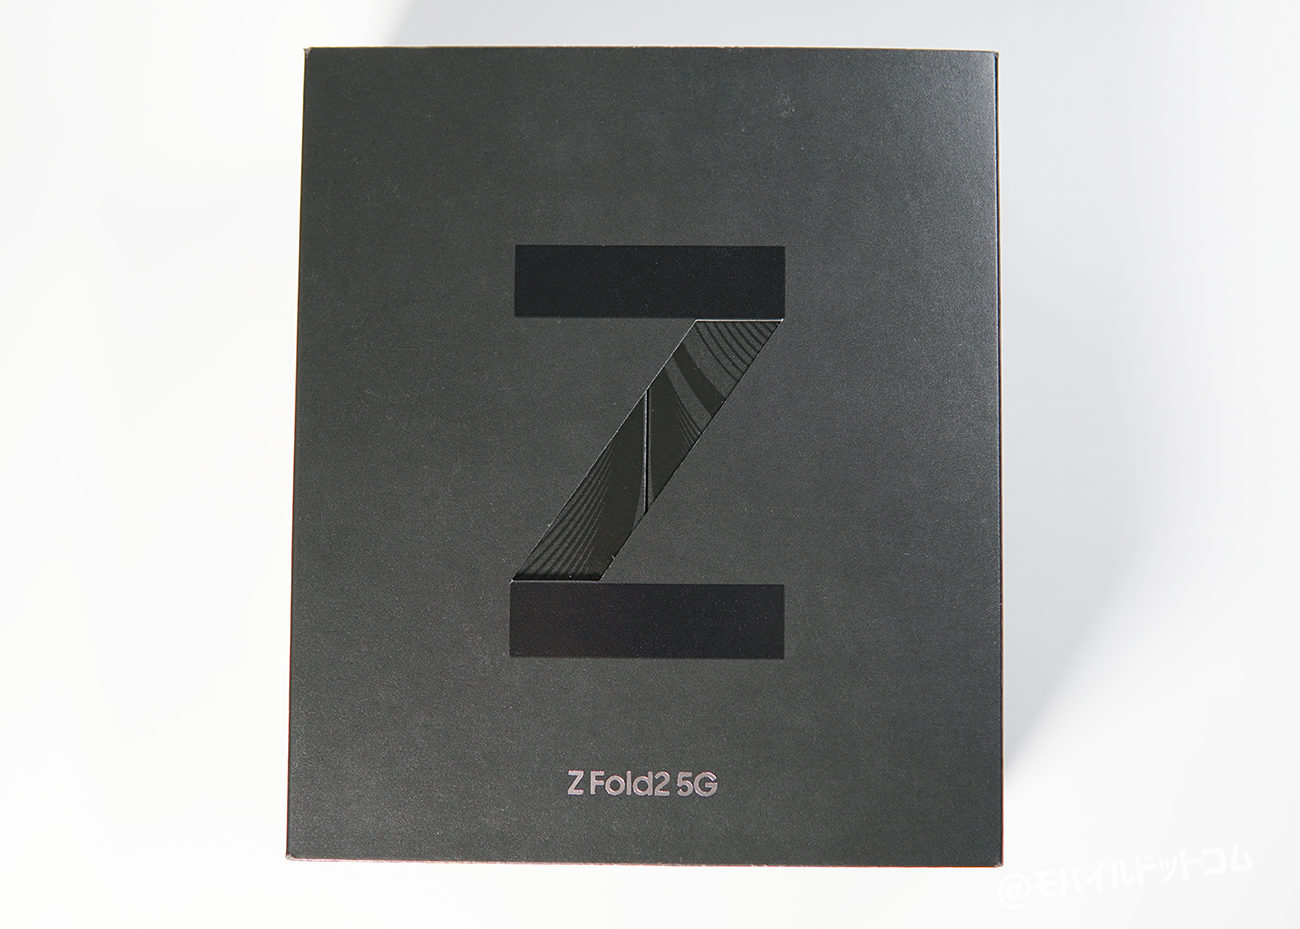 Galaxy Z Fold2 5Gのパッケージ